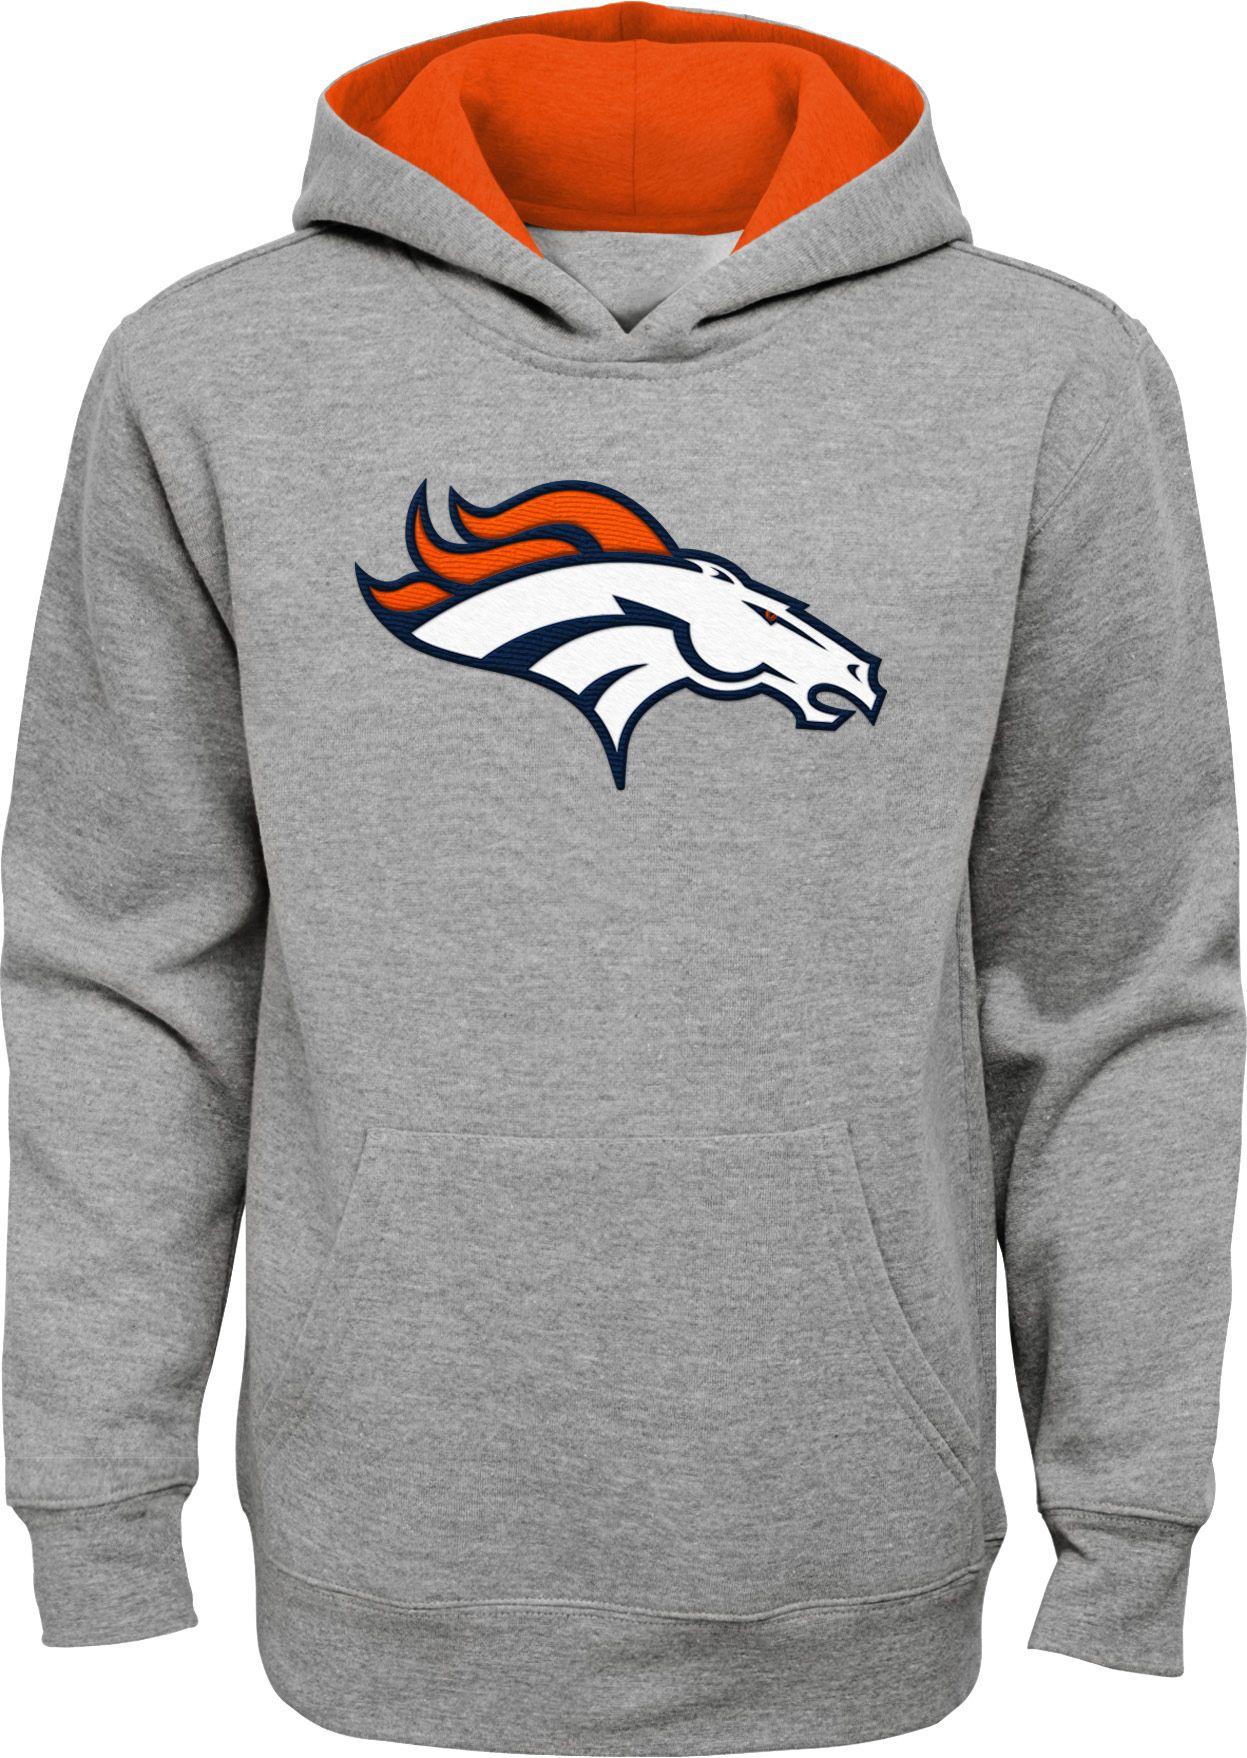 New NFL Team Apparel Youth Denver Broncos Prime Grey Pullover Hoodie